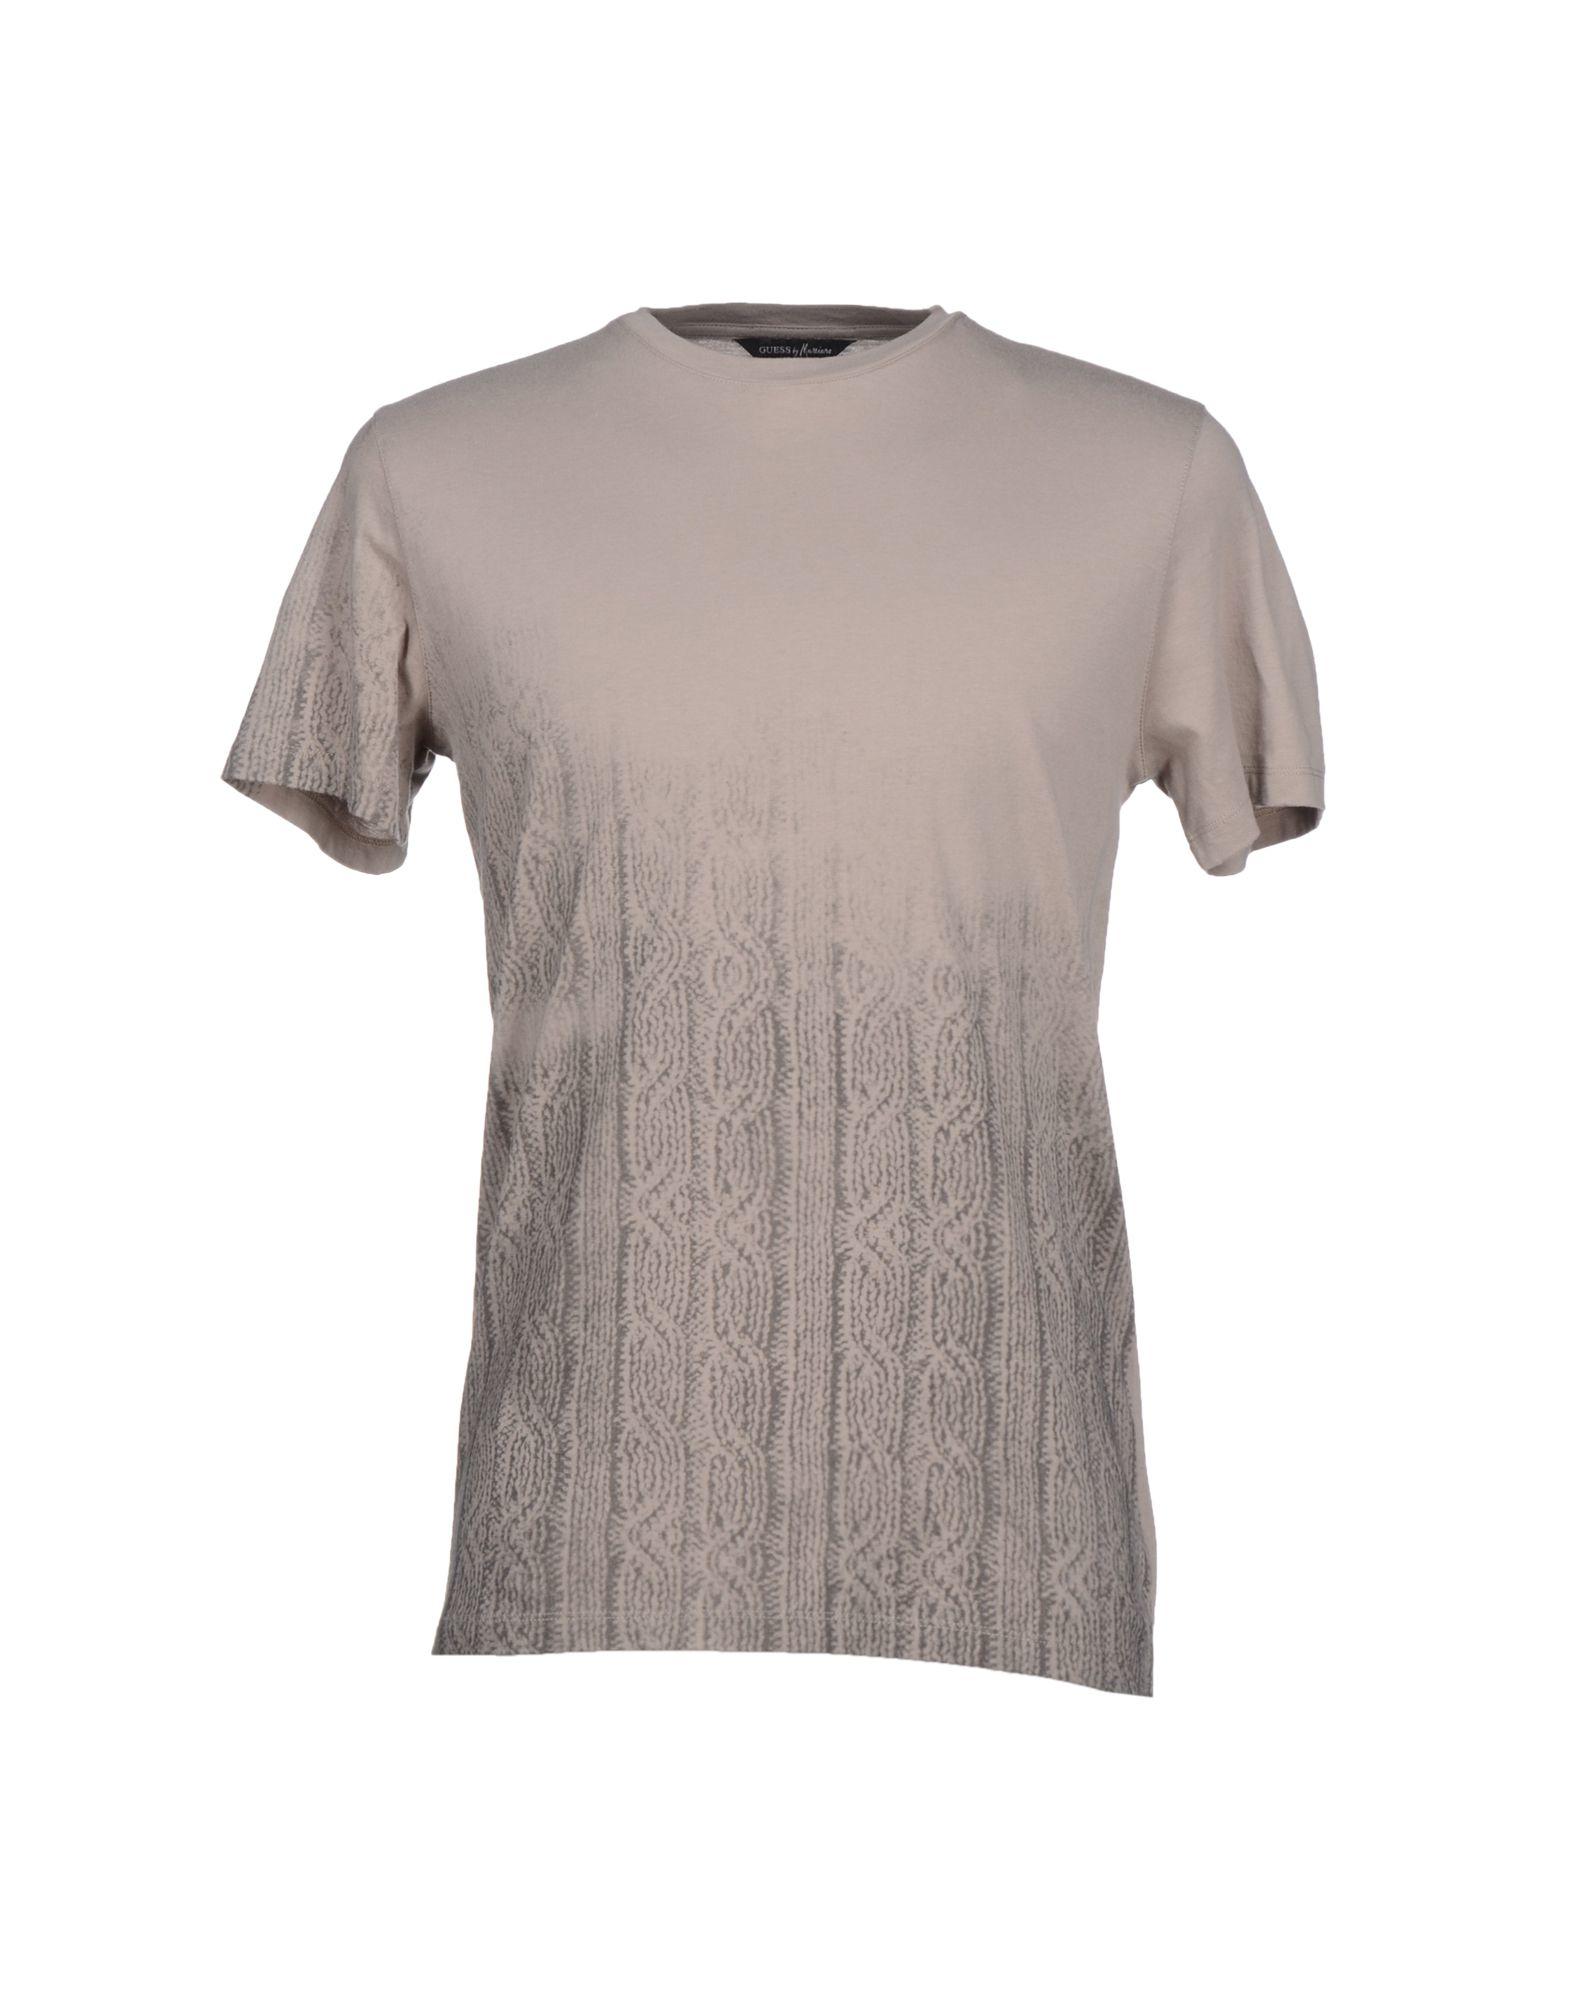 guess t shirt in khaki for men lyst. Black Bedroom Furniture Sets. Home Design Ideas